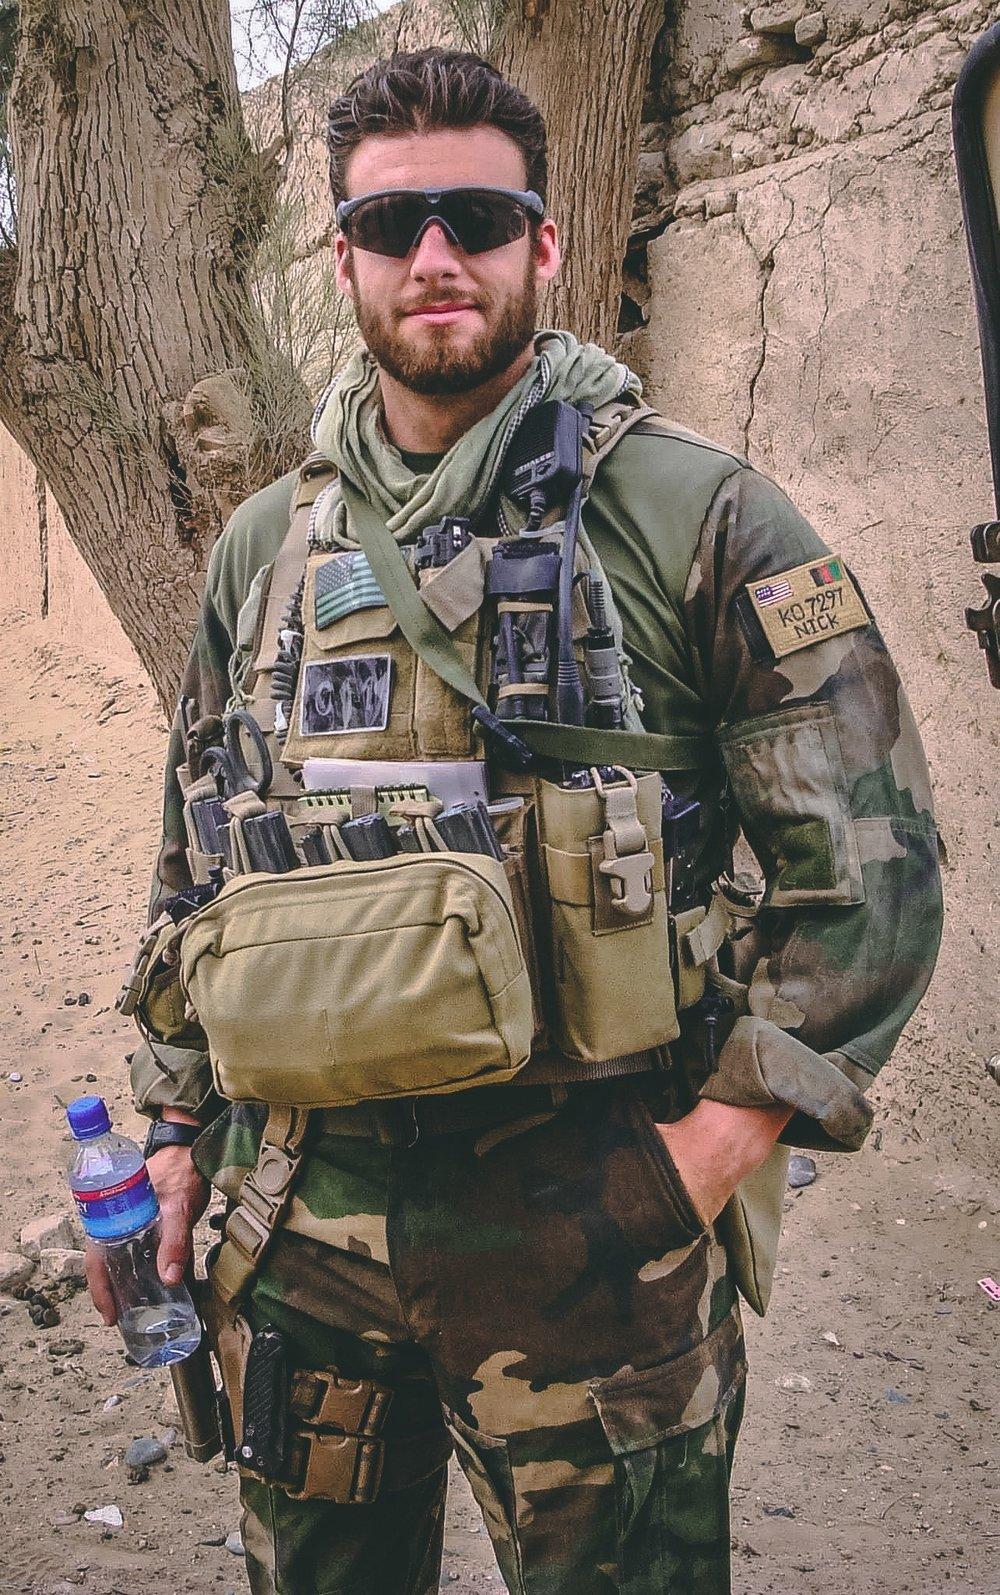 Circa 2009, Afghanistan MSOT 8213